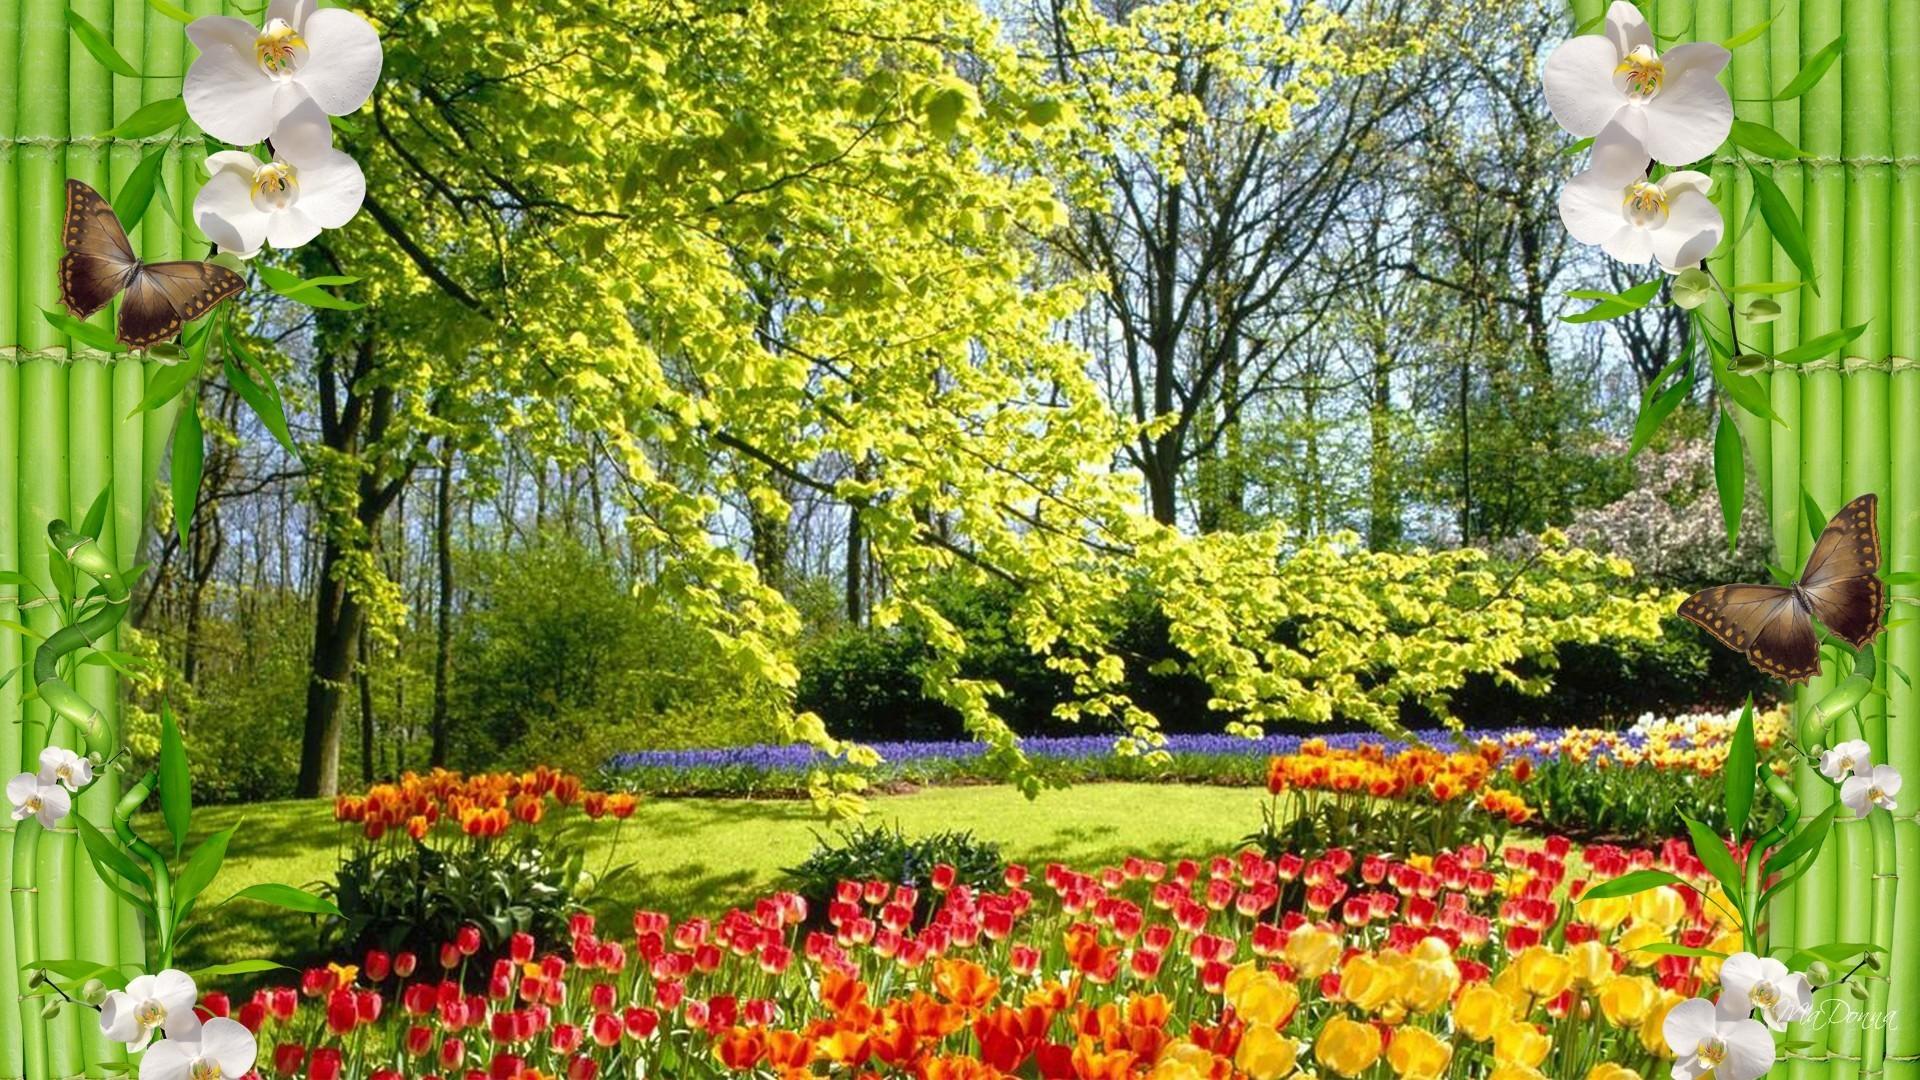 Bamboo Trees Paradise Spring Summer Floral Paaradise Flowers Park Wallpaper  Windows 7 Flower – 1920×1080